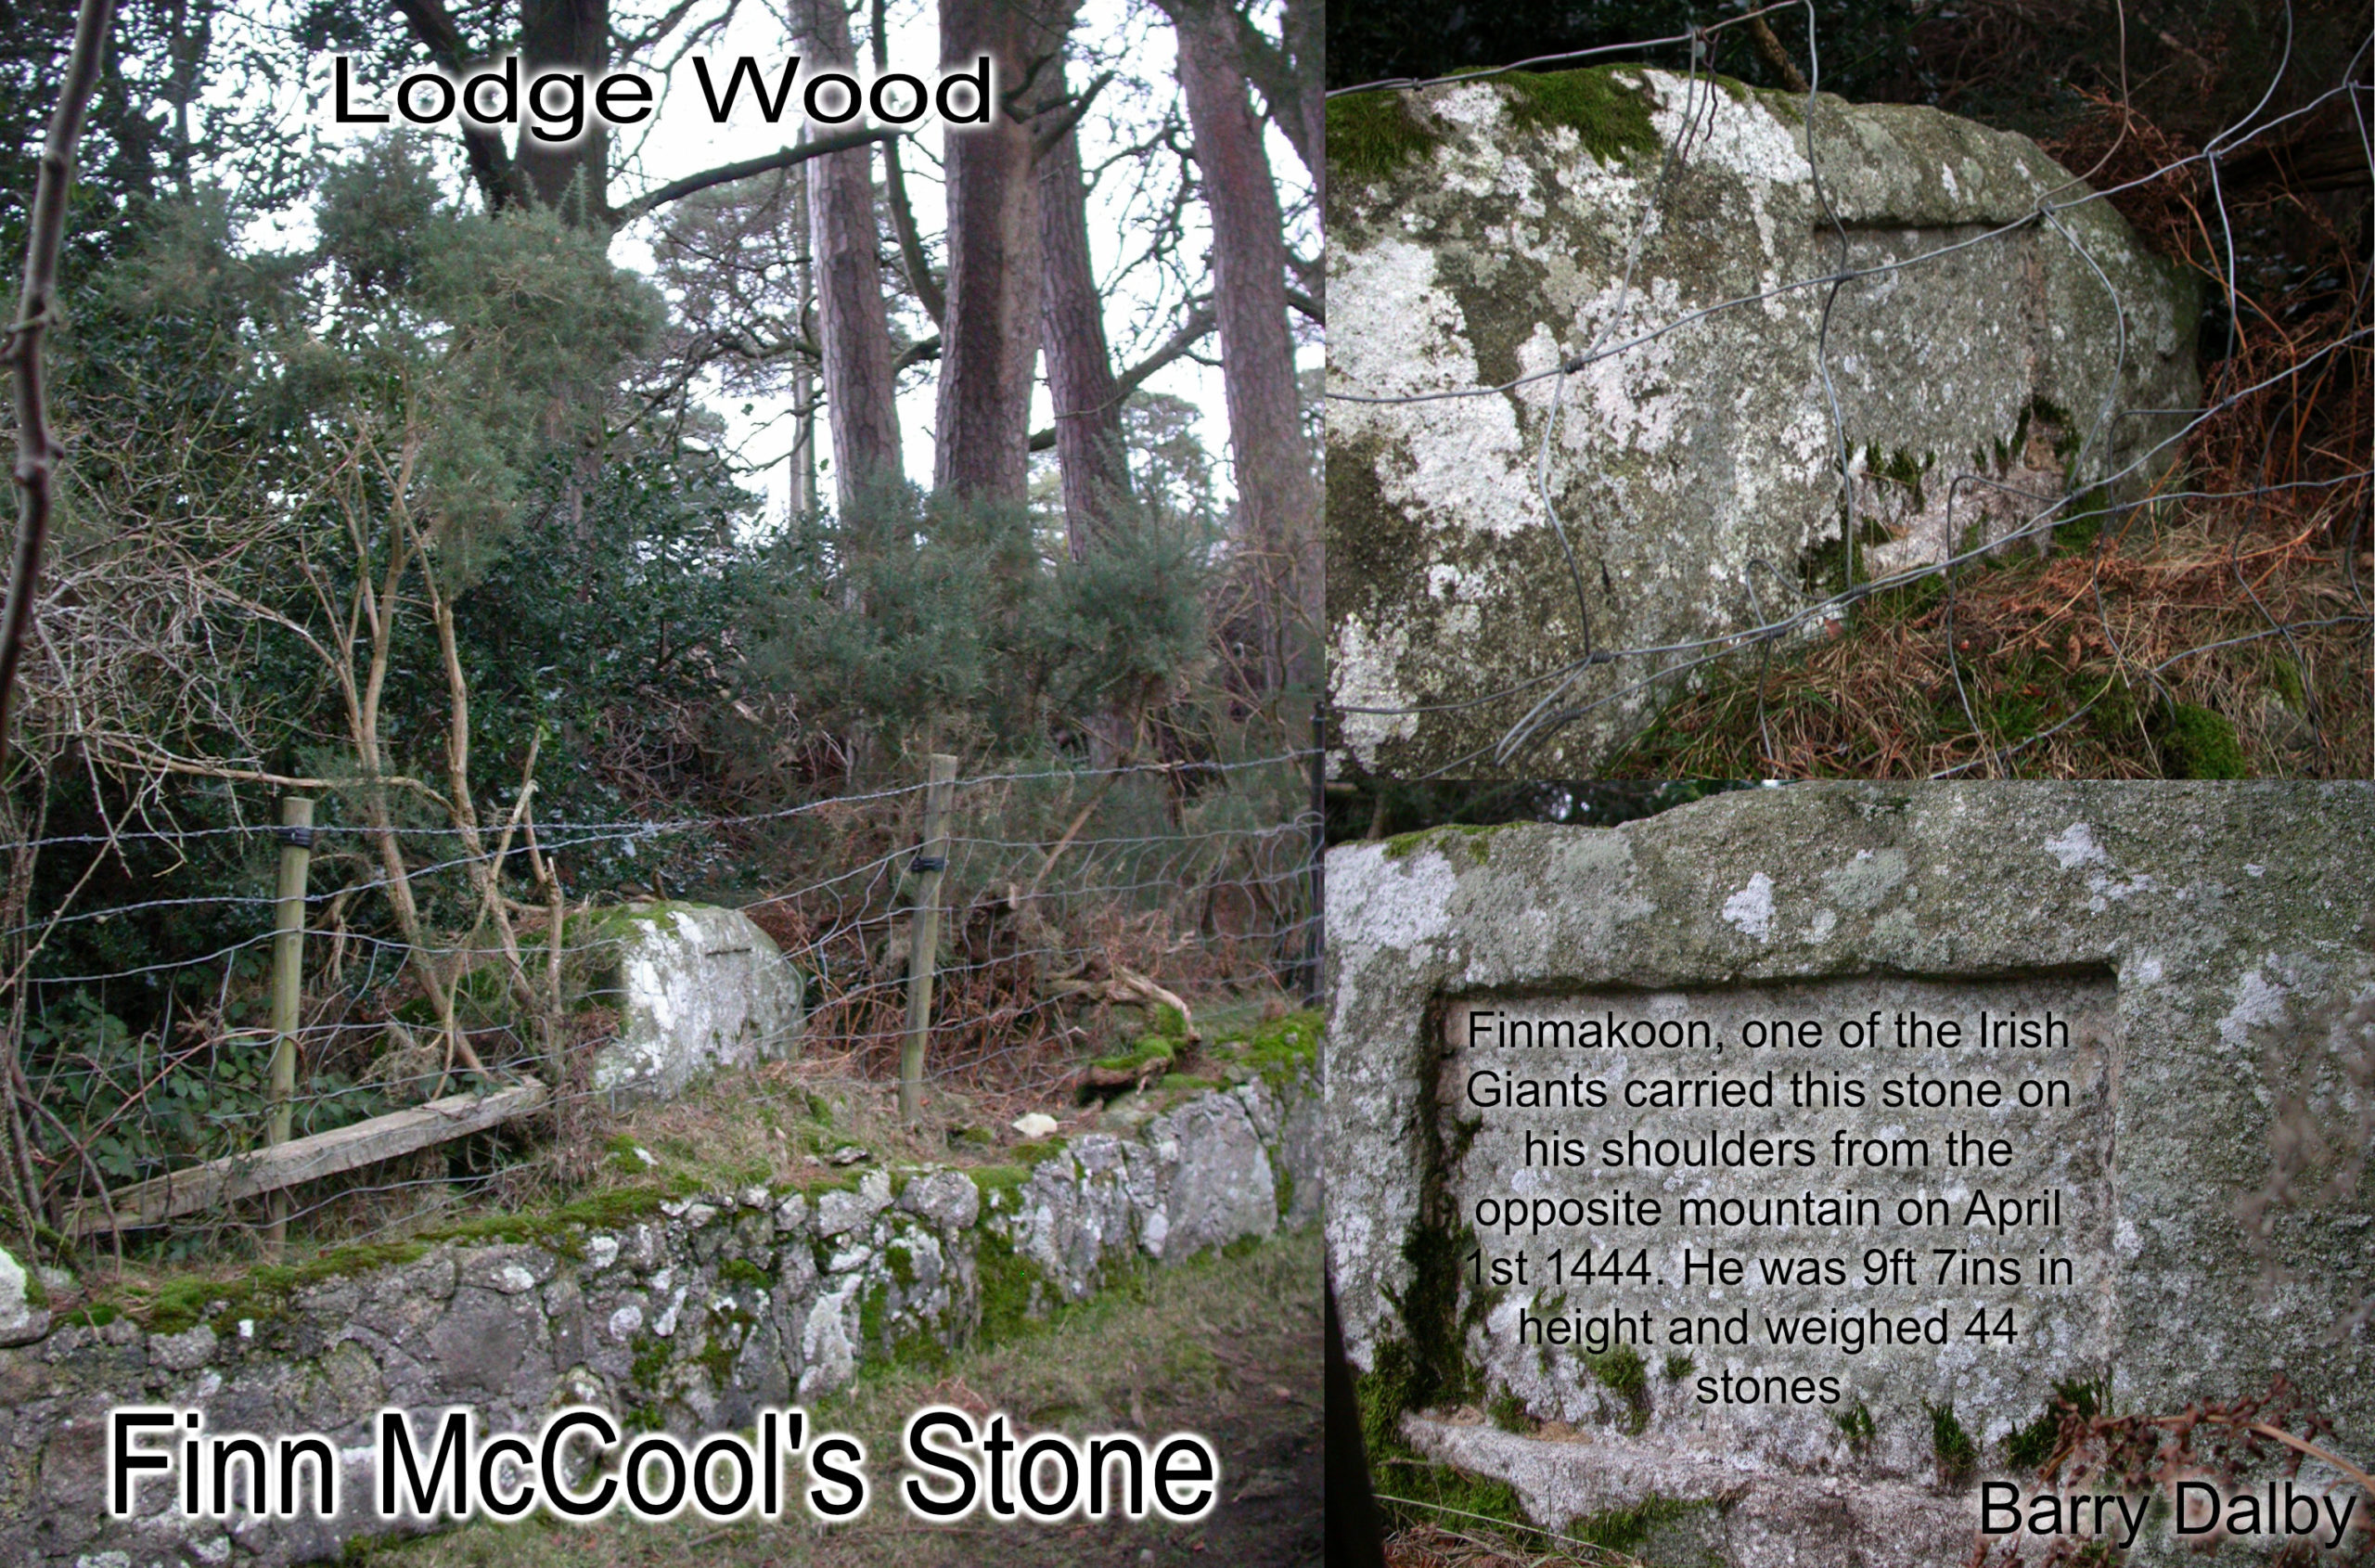 Finn McCool's Stone